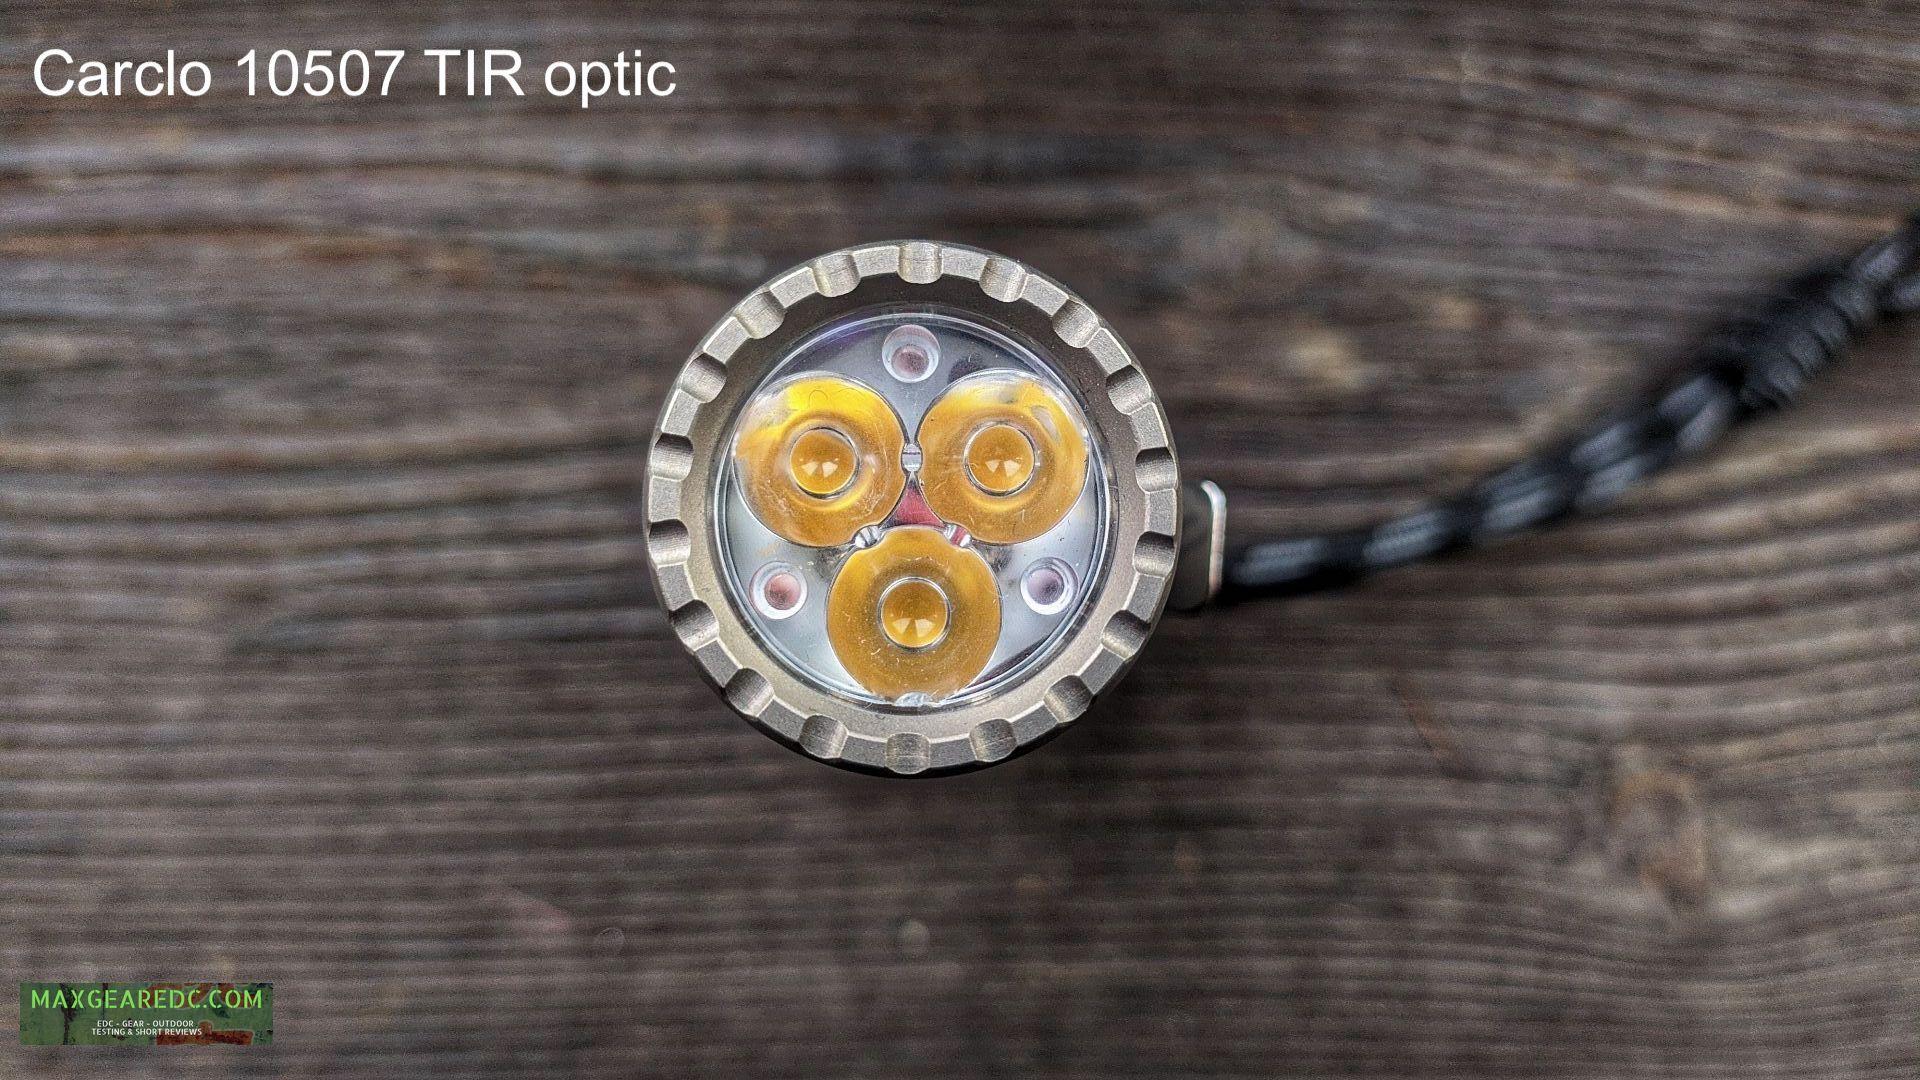 Lumintop_LM10_Flashlight_Review_Titanium_18650_maxgearedc.com_EDC_GEAR_OUTDOOR_TESTING_and_SHORT_REVIEWS_4